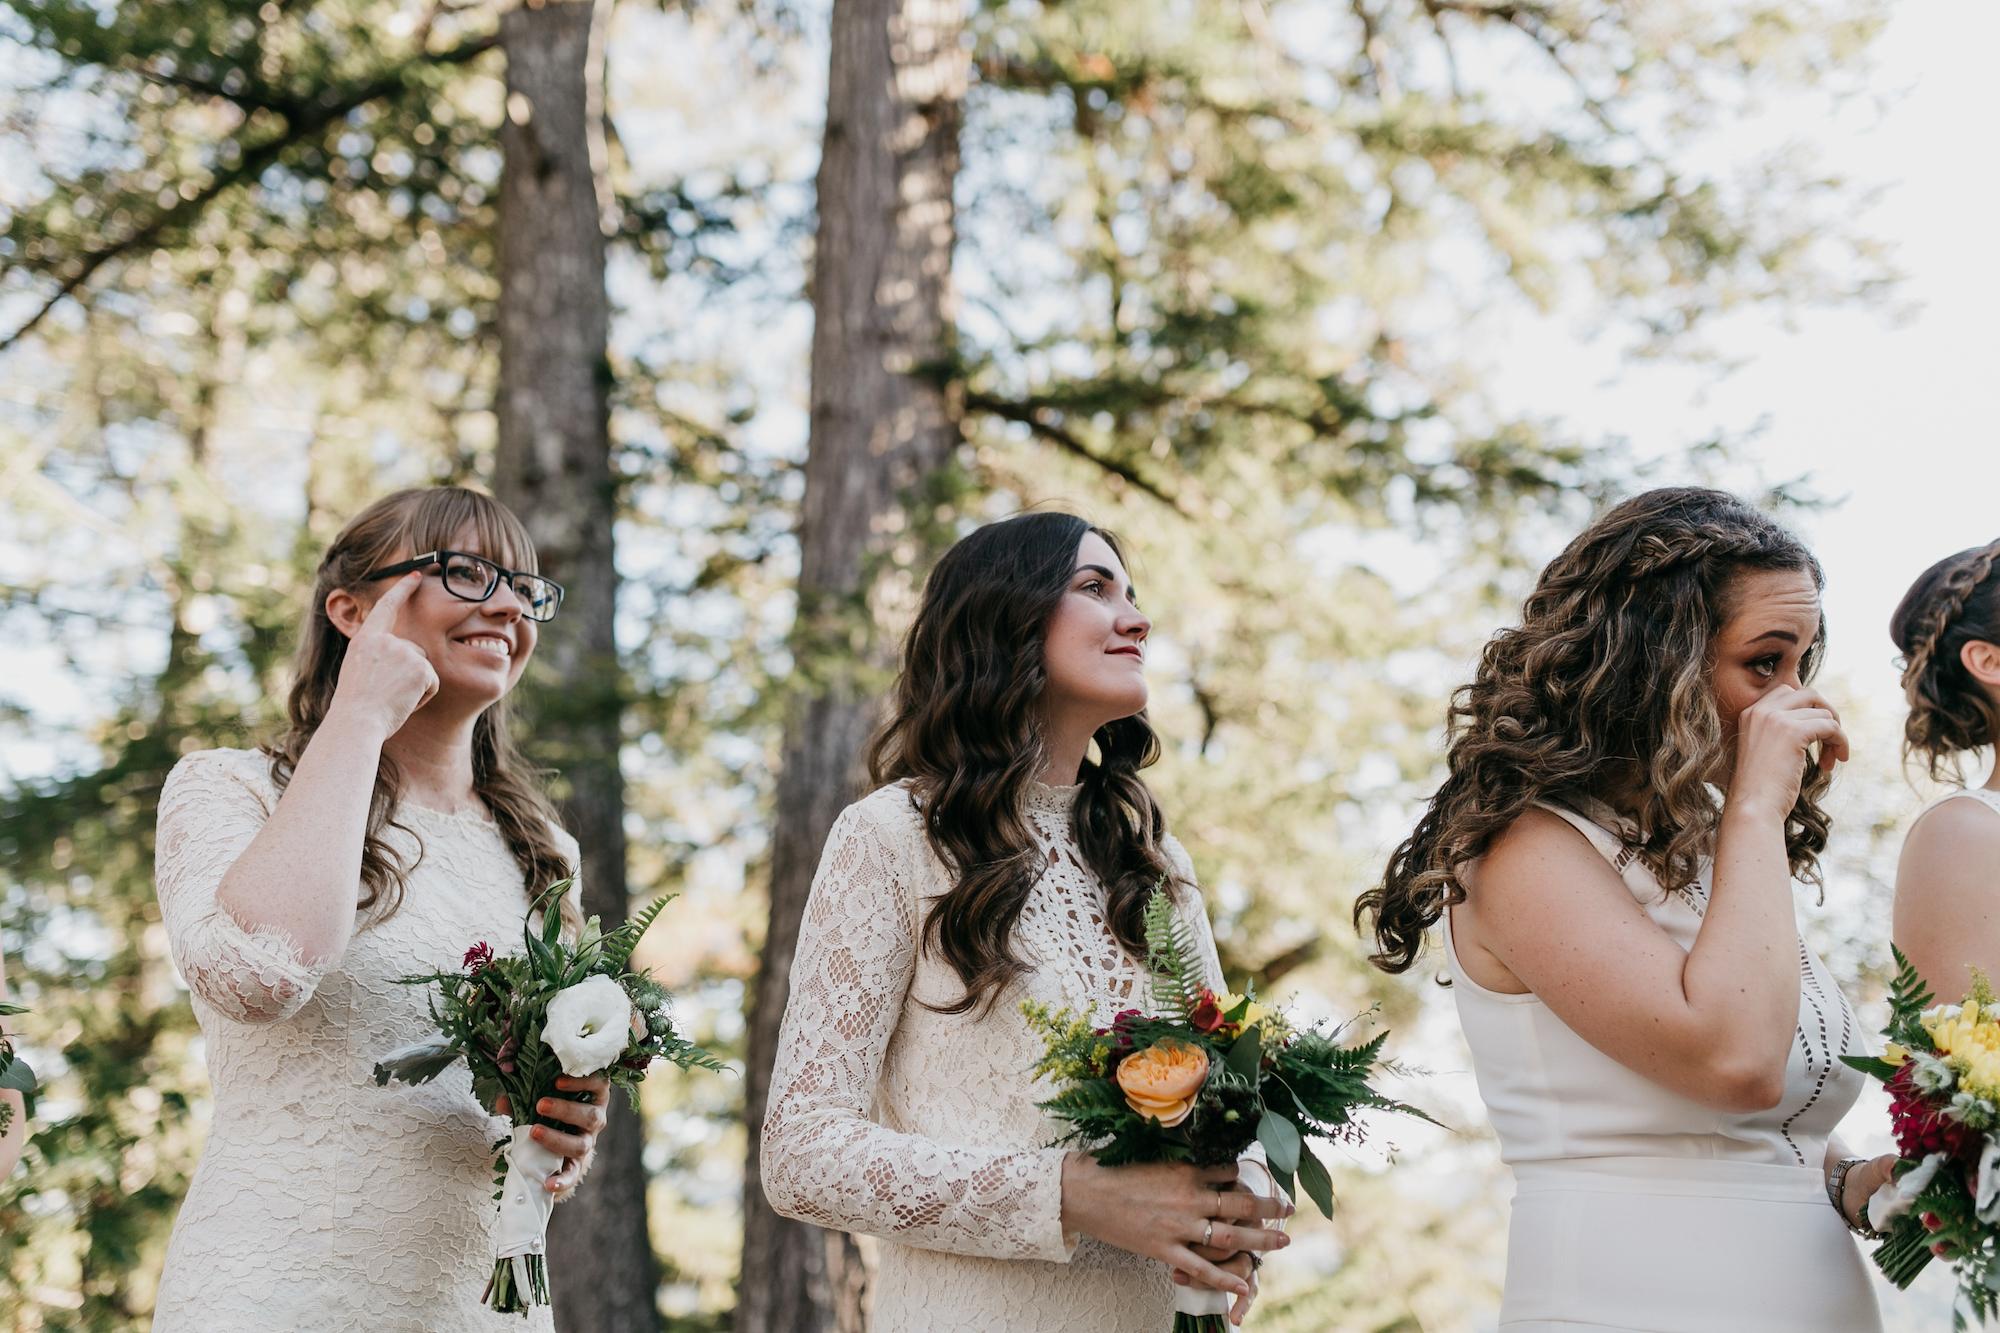 anvil-vineyards-wedding-photographer450.jpg